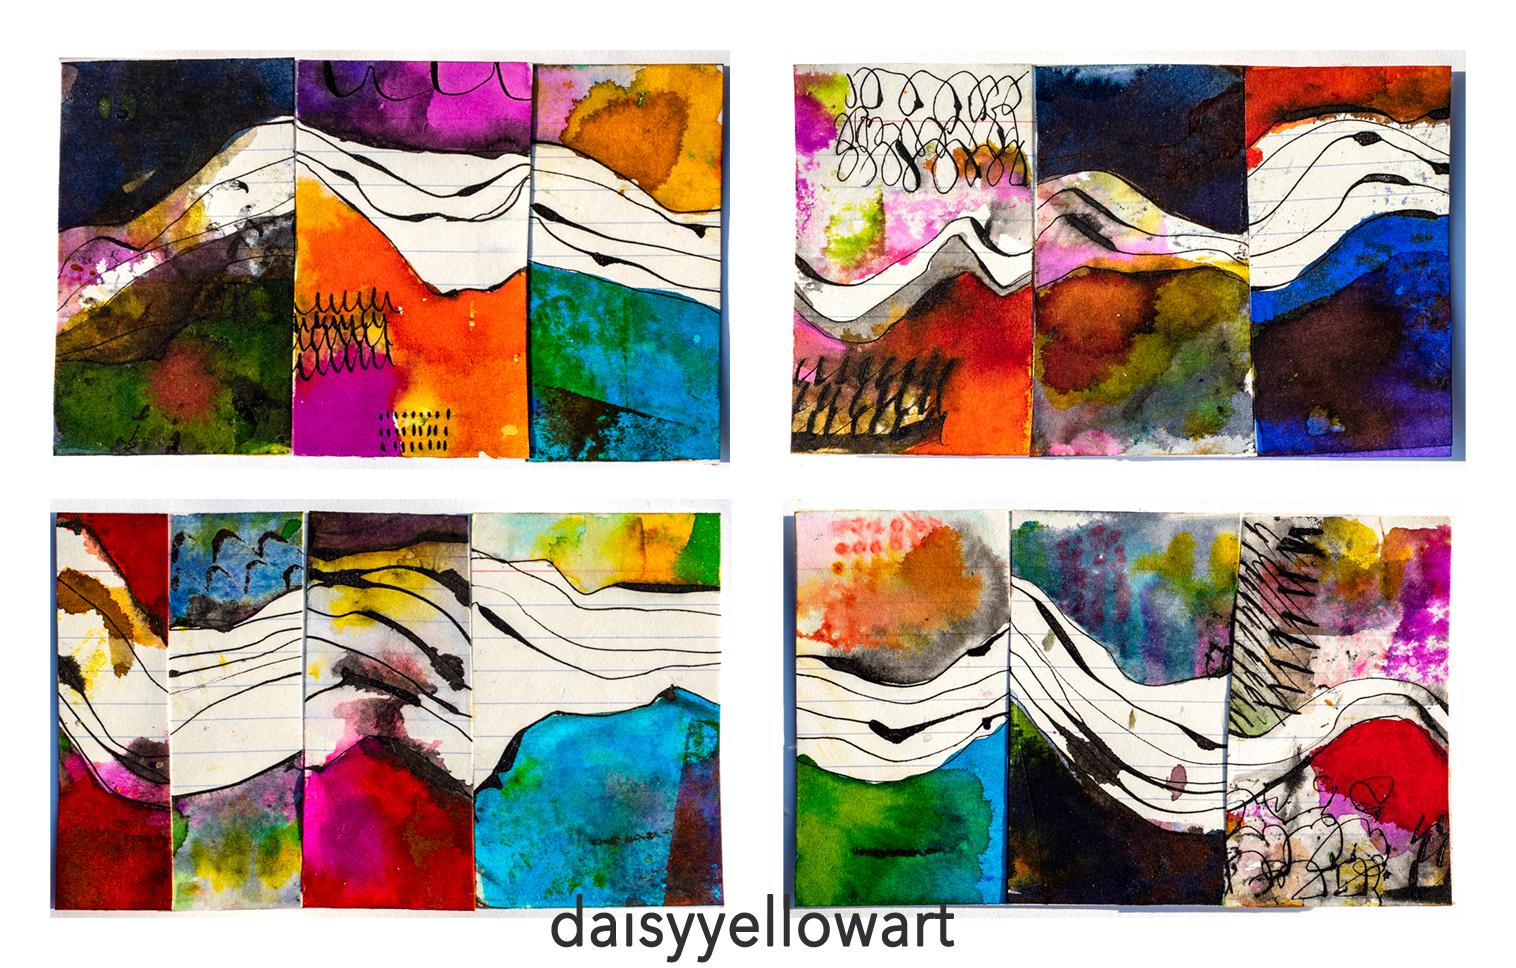 Landscapes 39-42 in ink, https://daisyyellowart.com